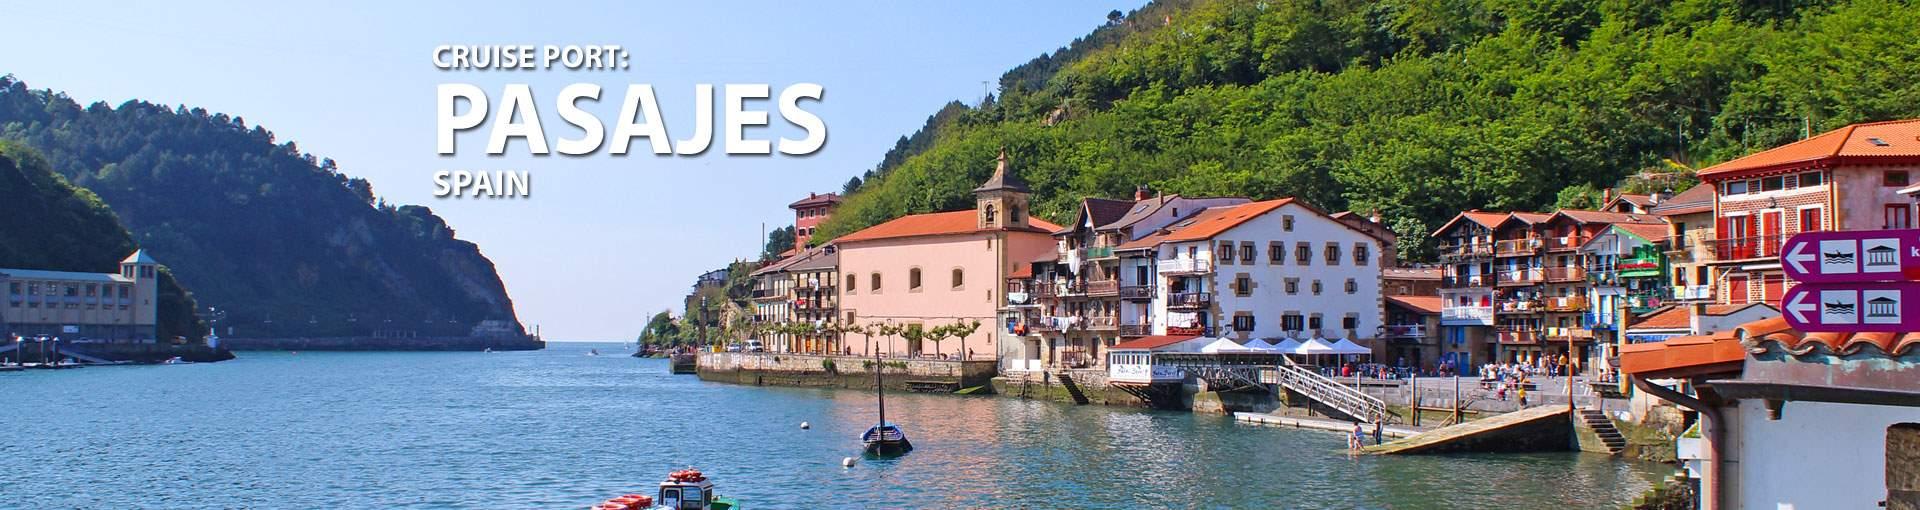 Cruises to Pasajes, Spain